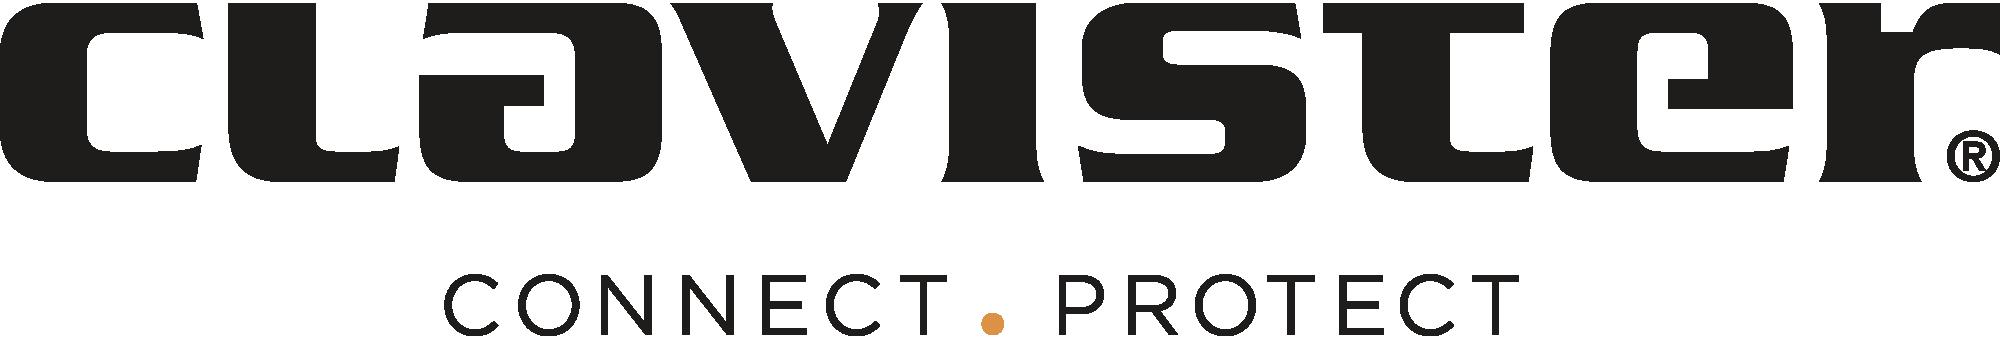 Clavister tagline logo black